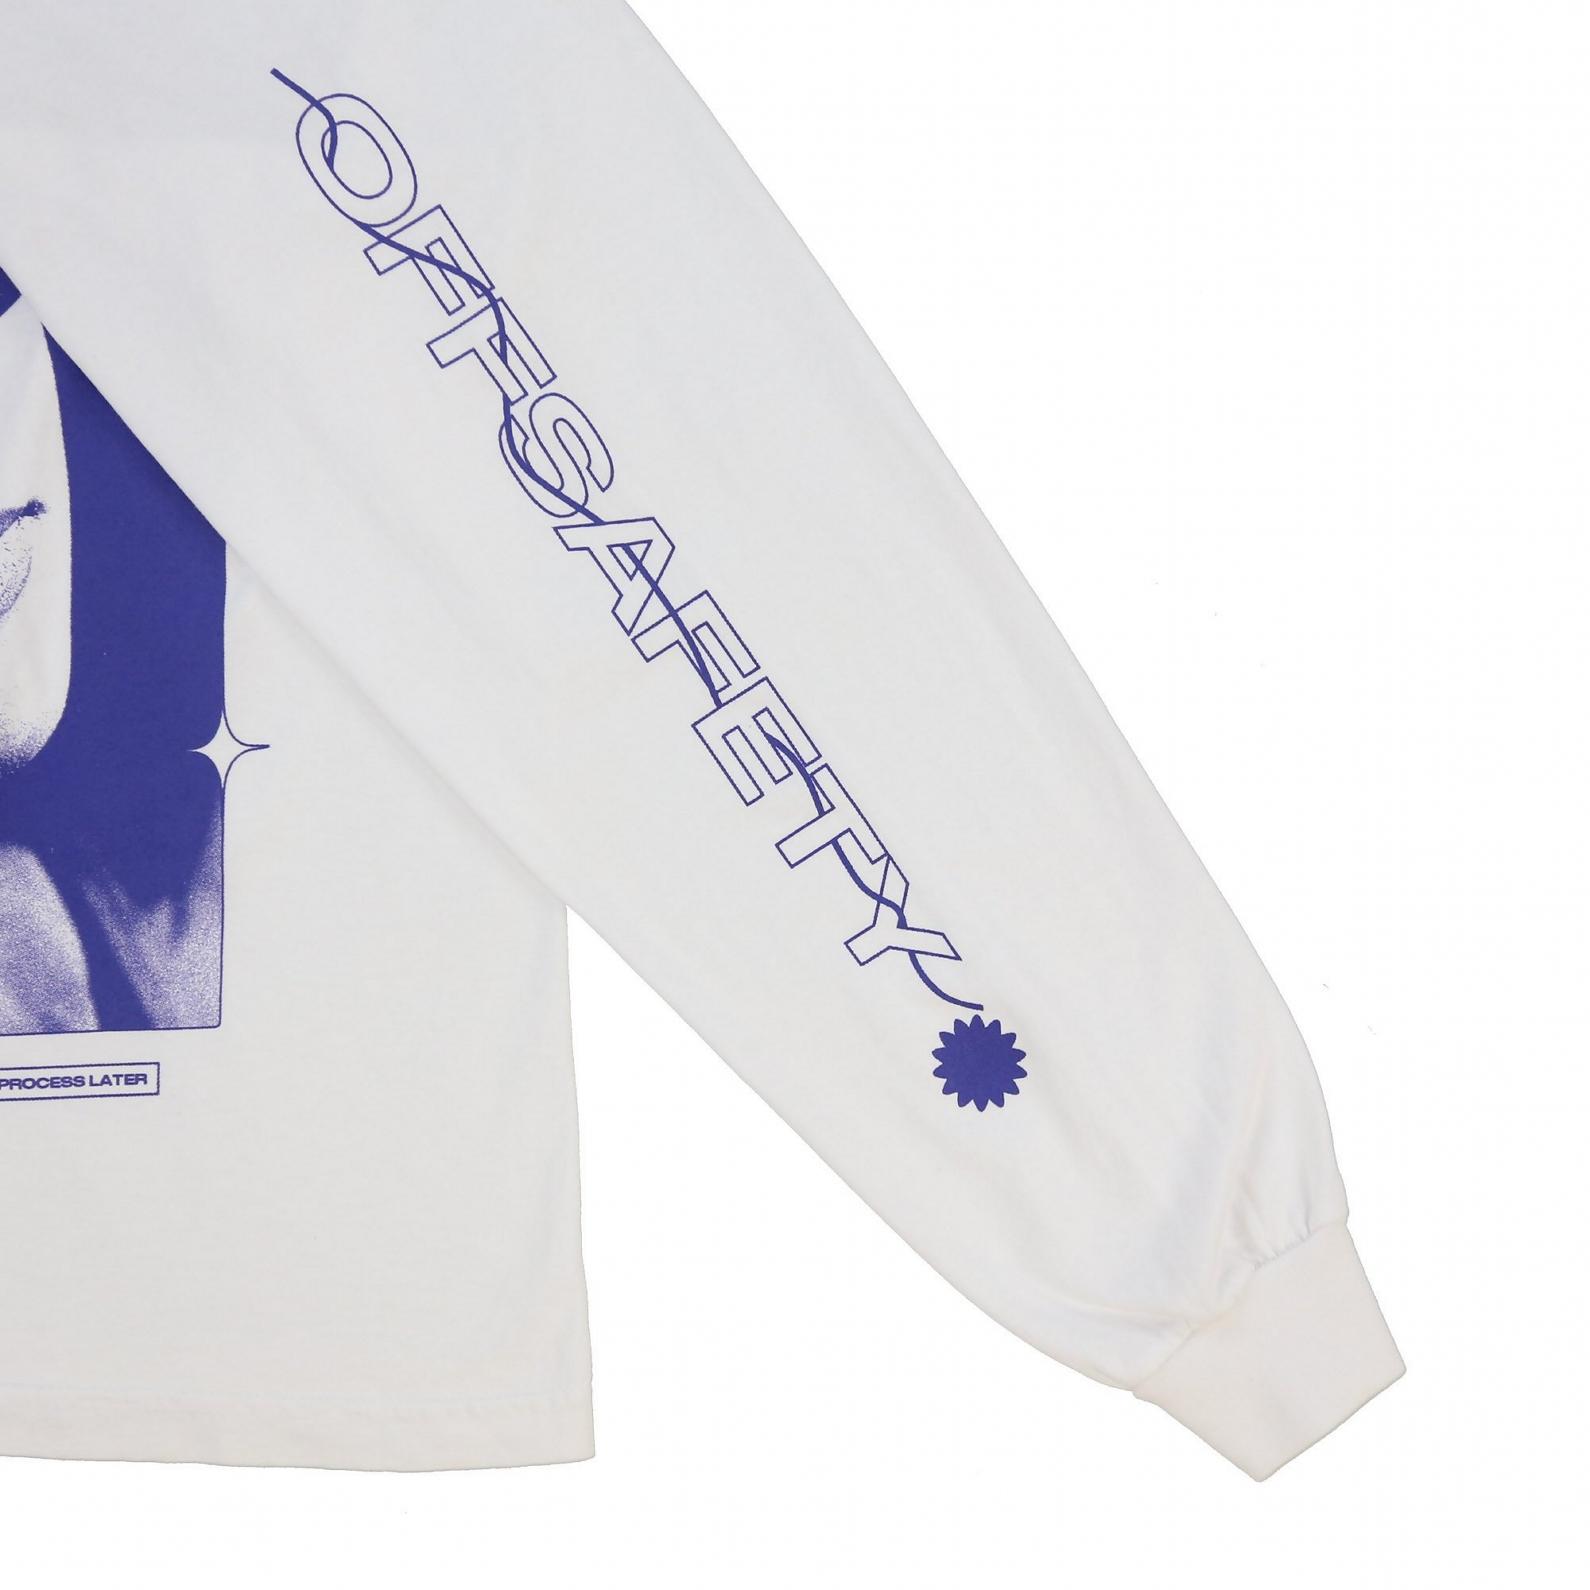 【OFF SAFETY/オフセーフティー】AALIYAH OA LS TEE 長袖Tシャツ / WHITE